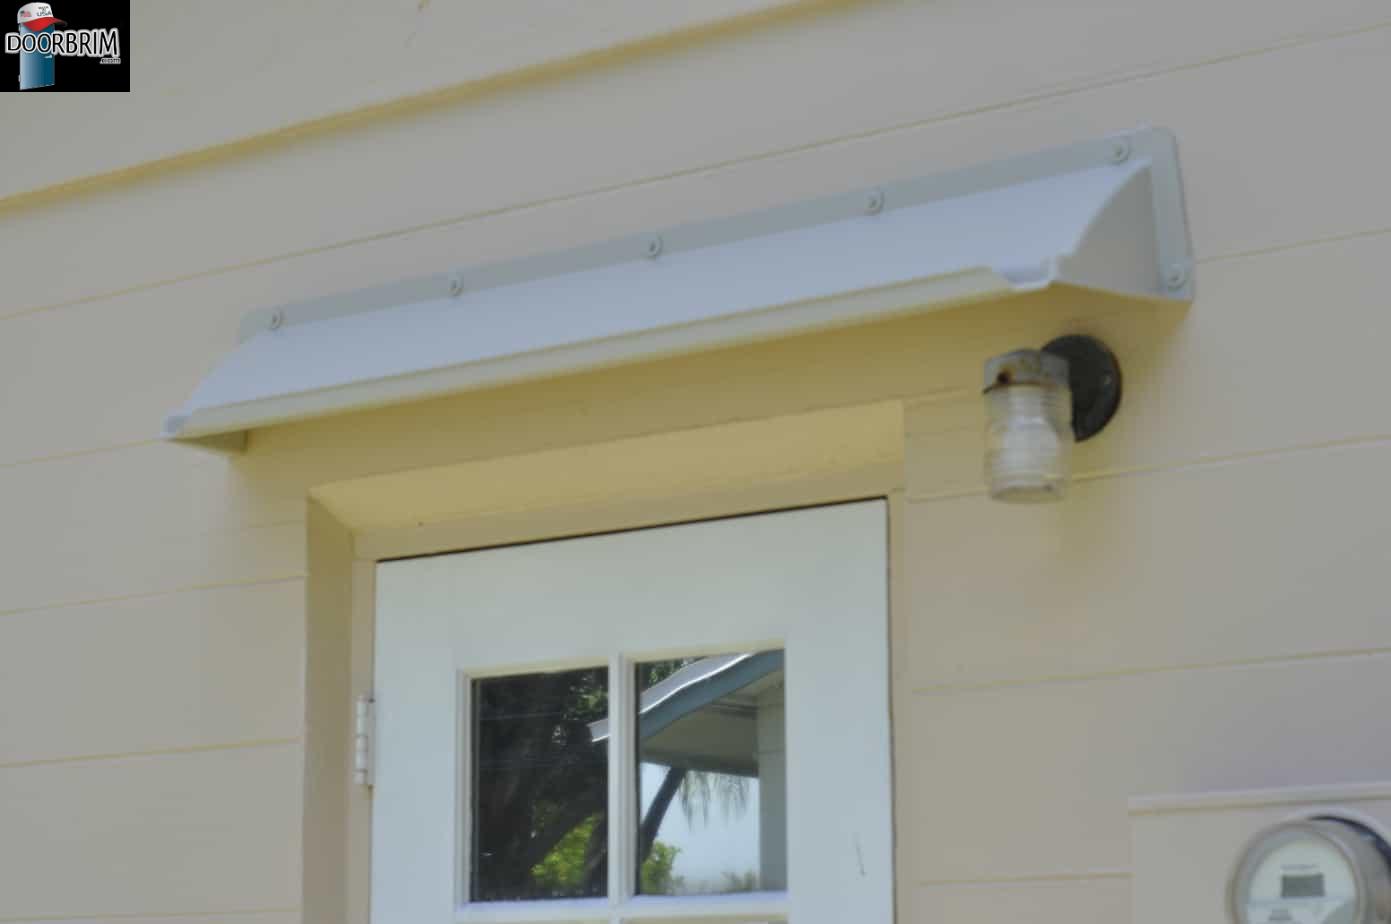 Discount Door Awning Direct From Doorbrim Awnings